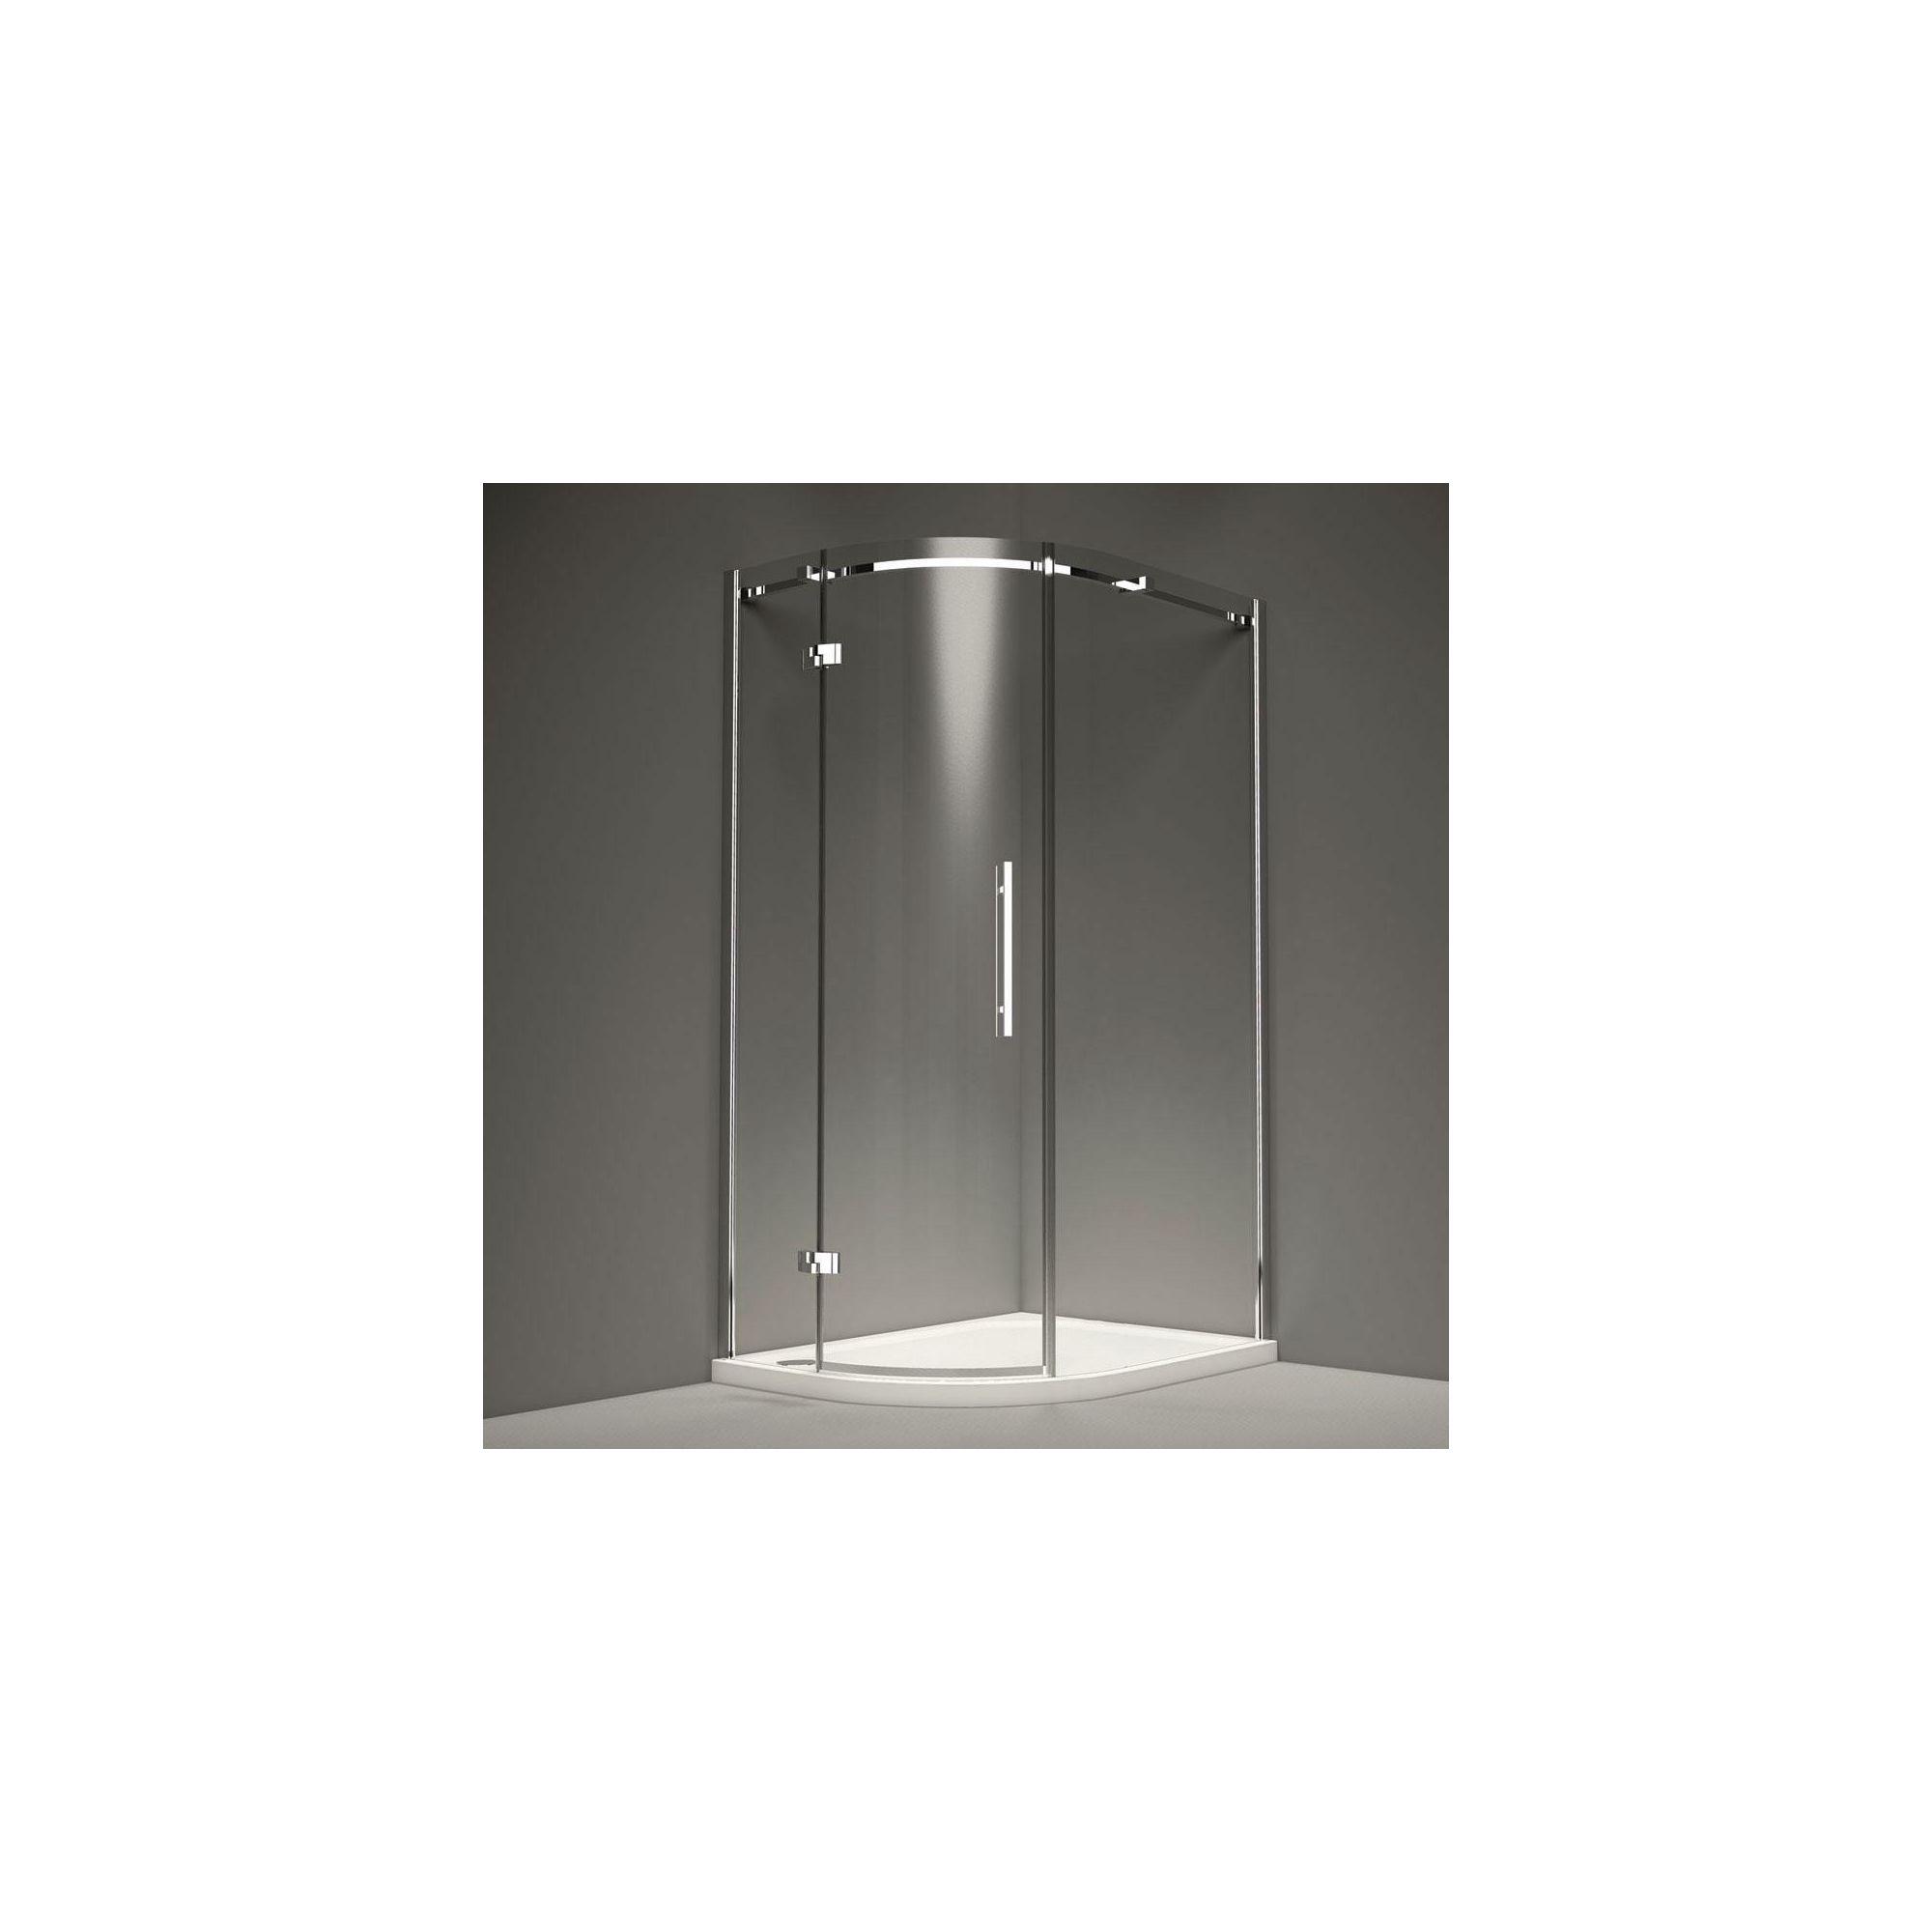 Merlyn Series 9 Offset Quadrant Shower Door, 900mm x 760mm, 8mm Glass, Left Handed at Tesco Direct